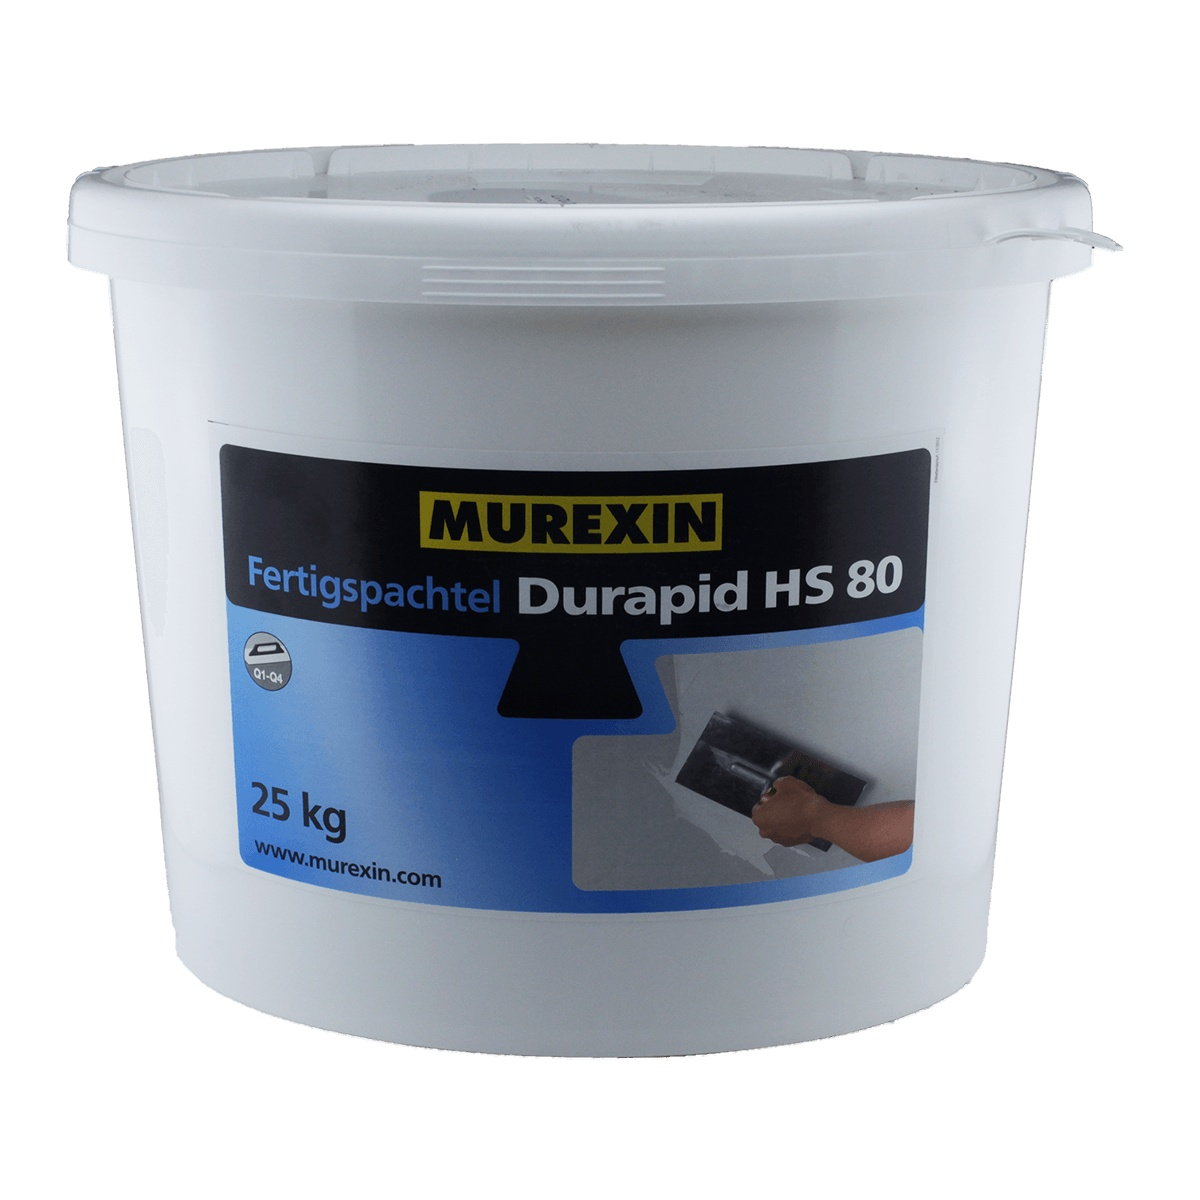 murexin gipsspachtelmasse fertigspachtel durapid hs 80 | ebay